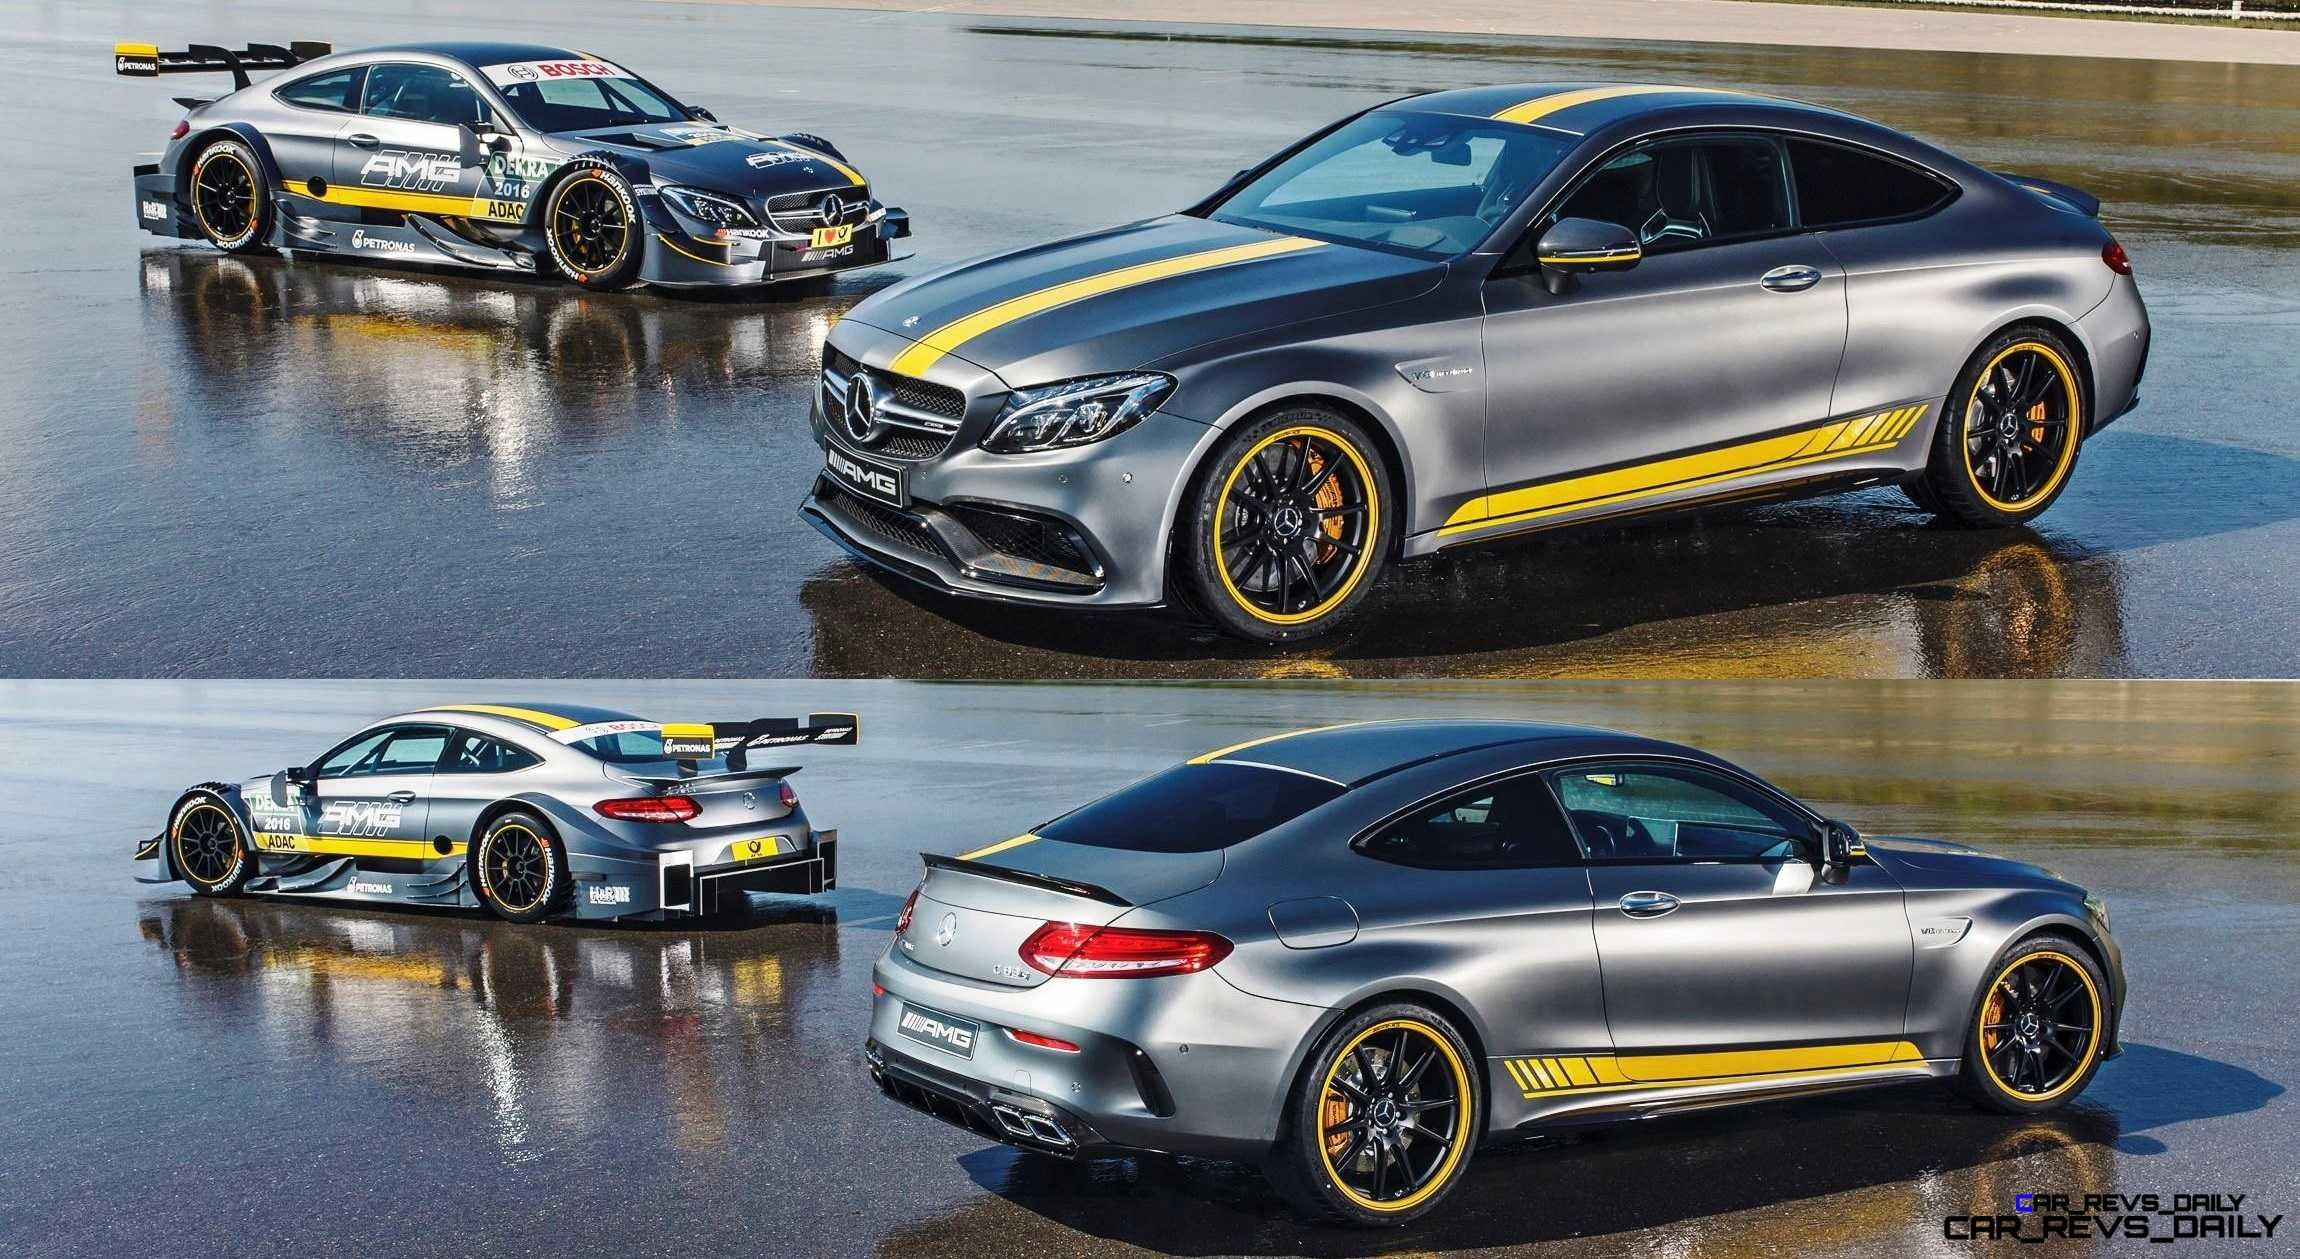 2017 Mercedes-AMG C63 Coupé Edition 1 + 2016 DTM Racecar 1